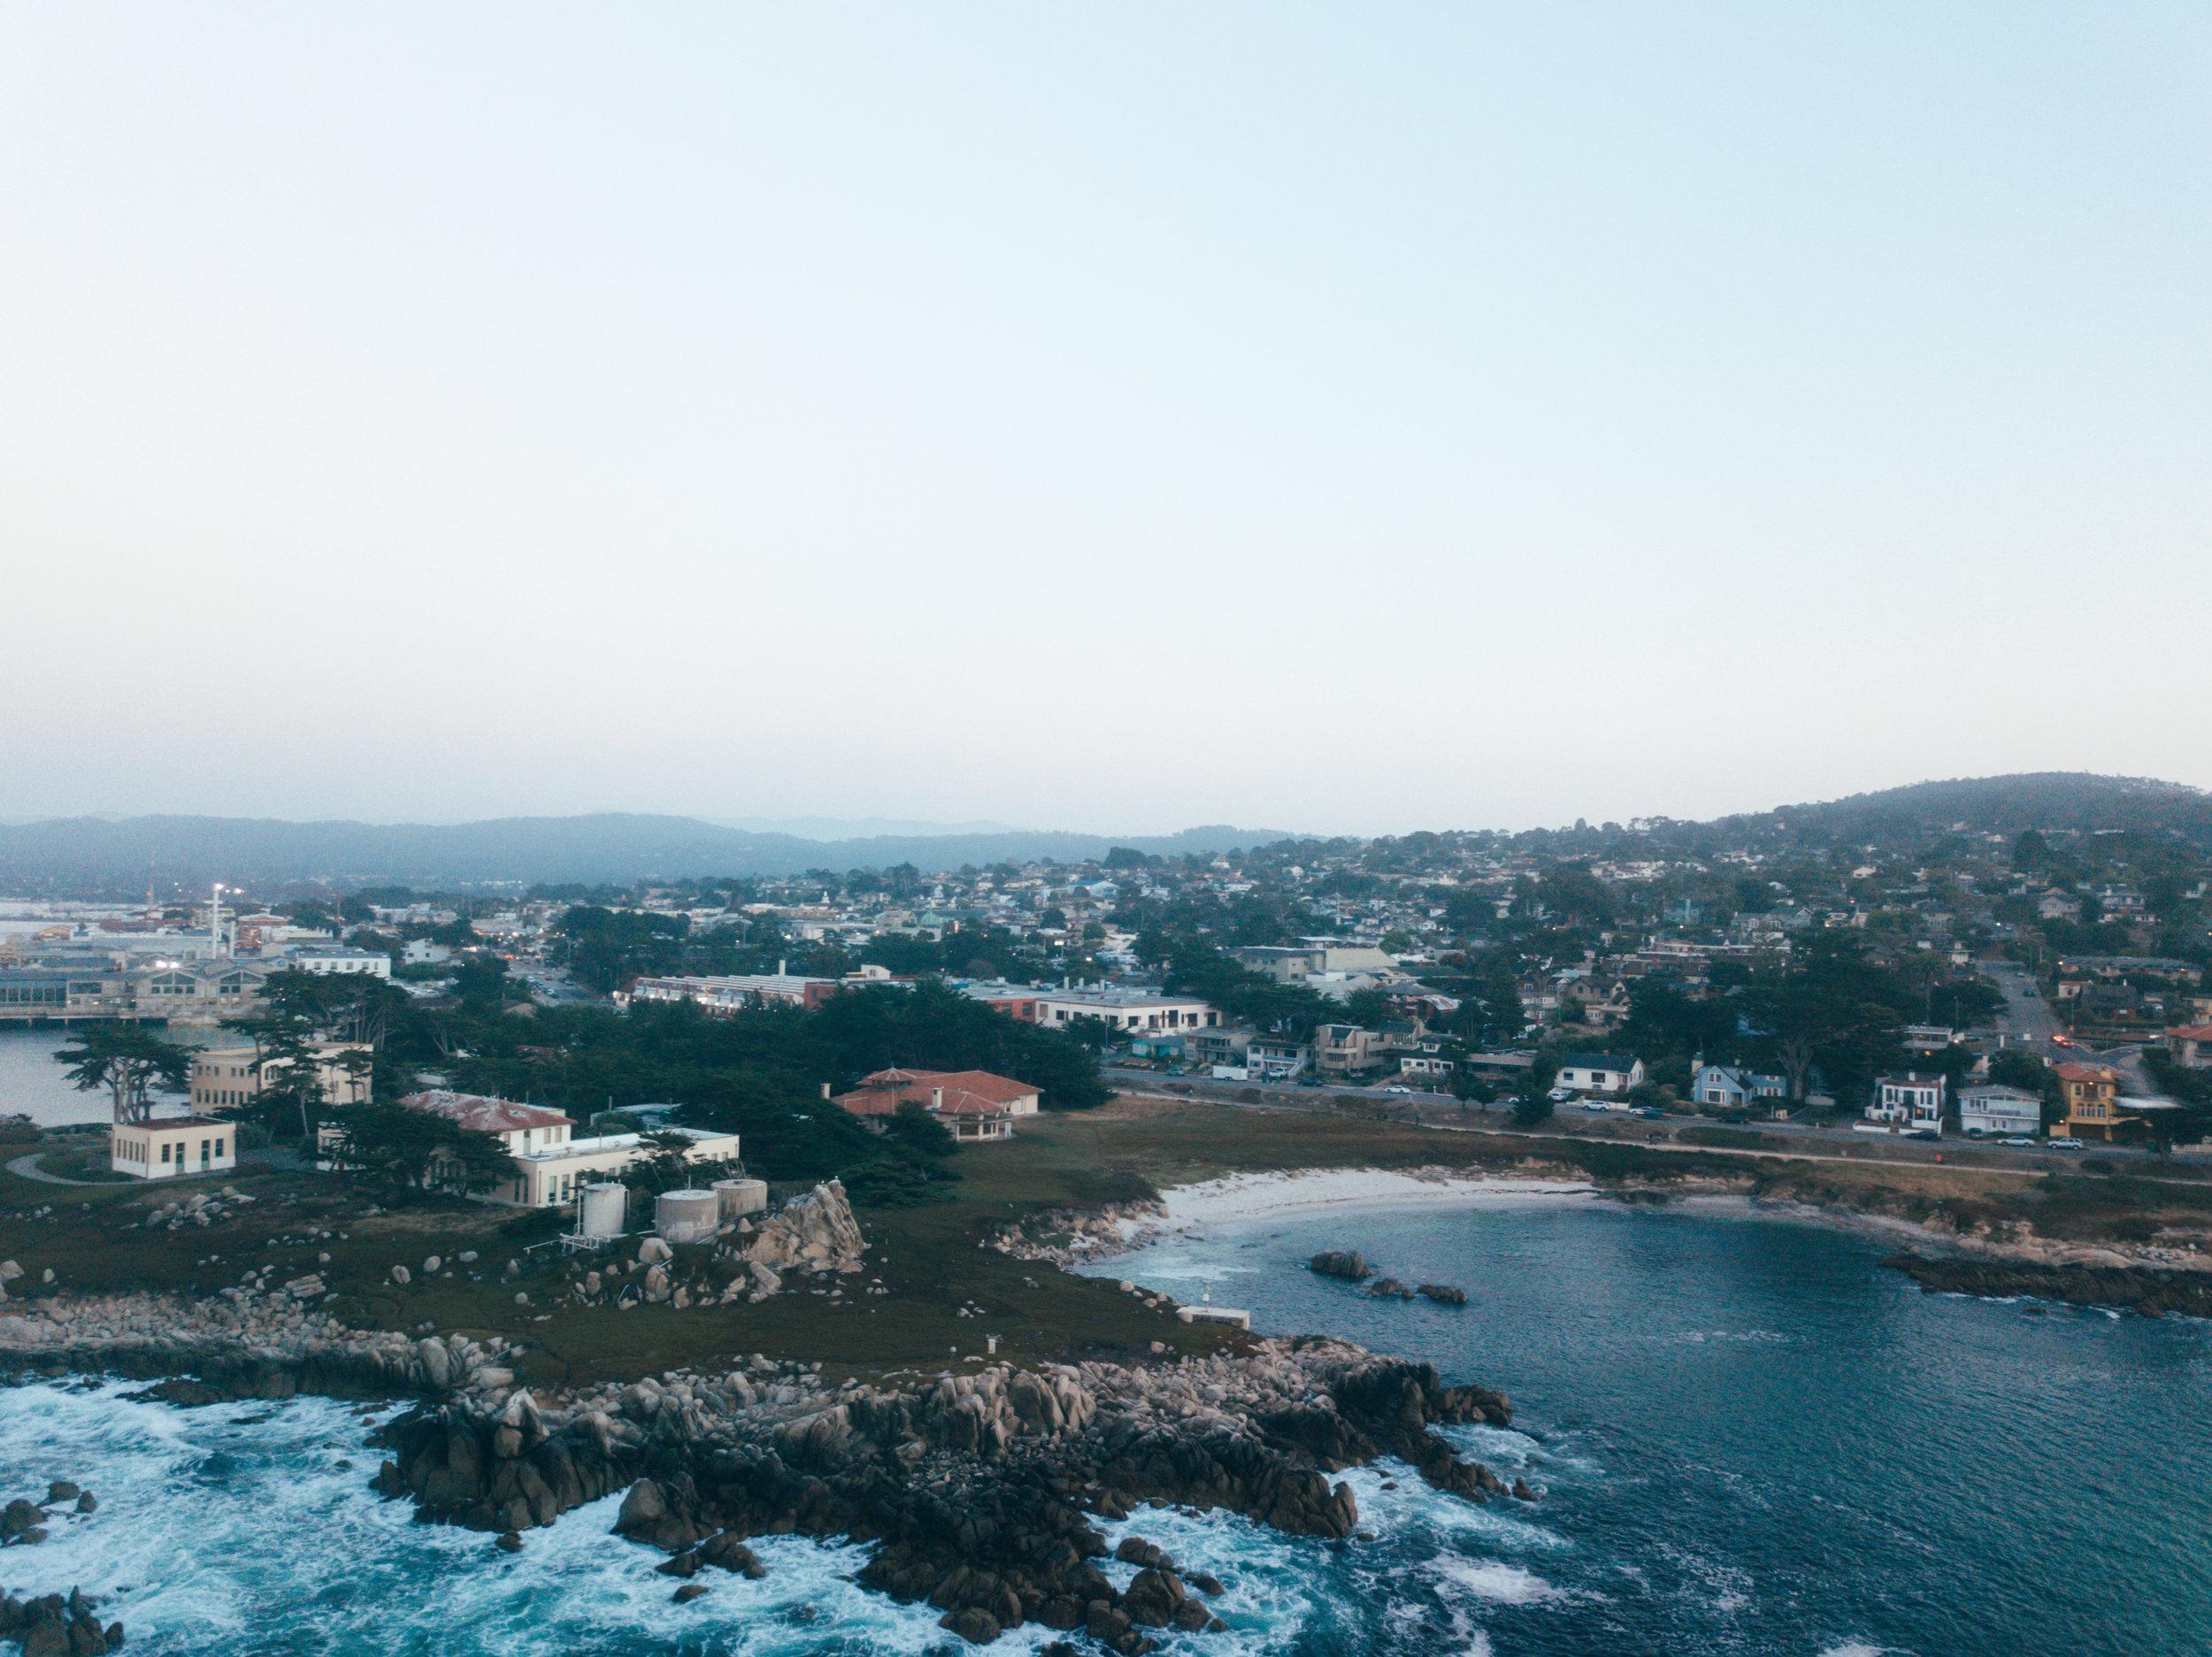 Stay_Driven_Monterey_Drone-1-2.jpg